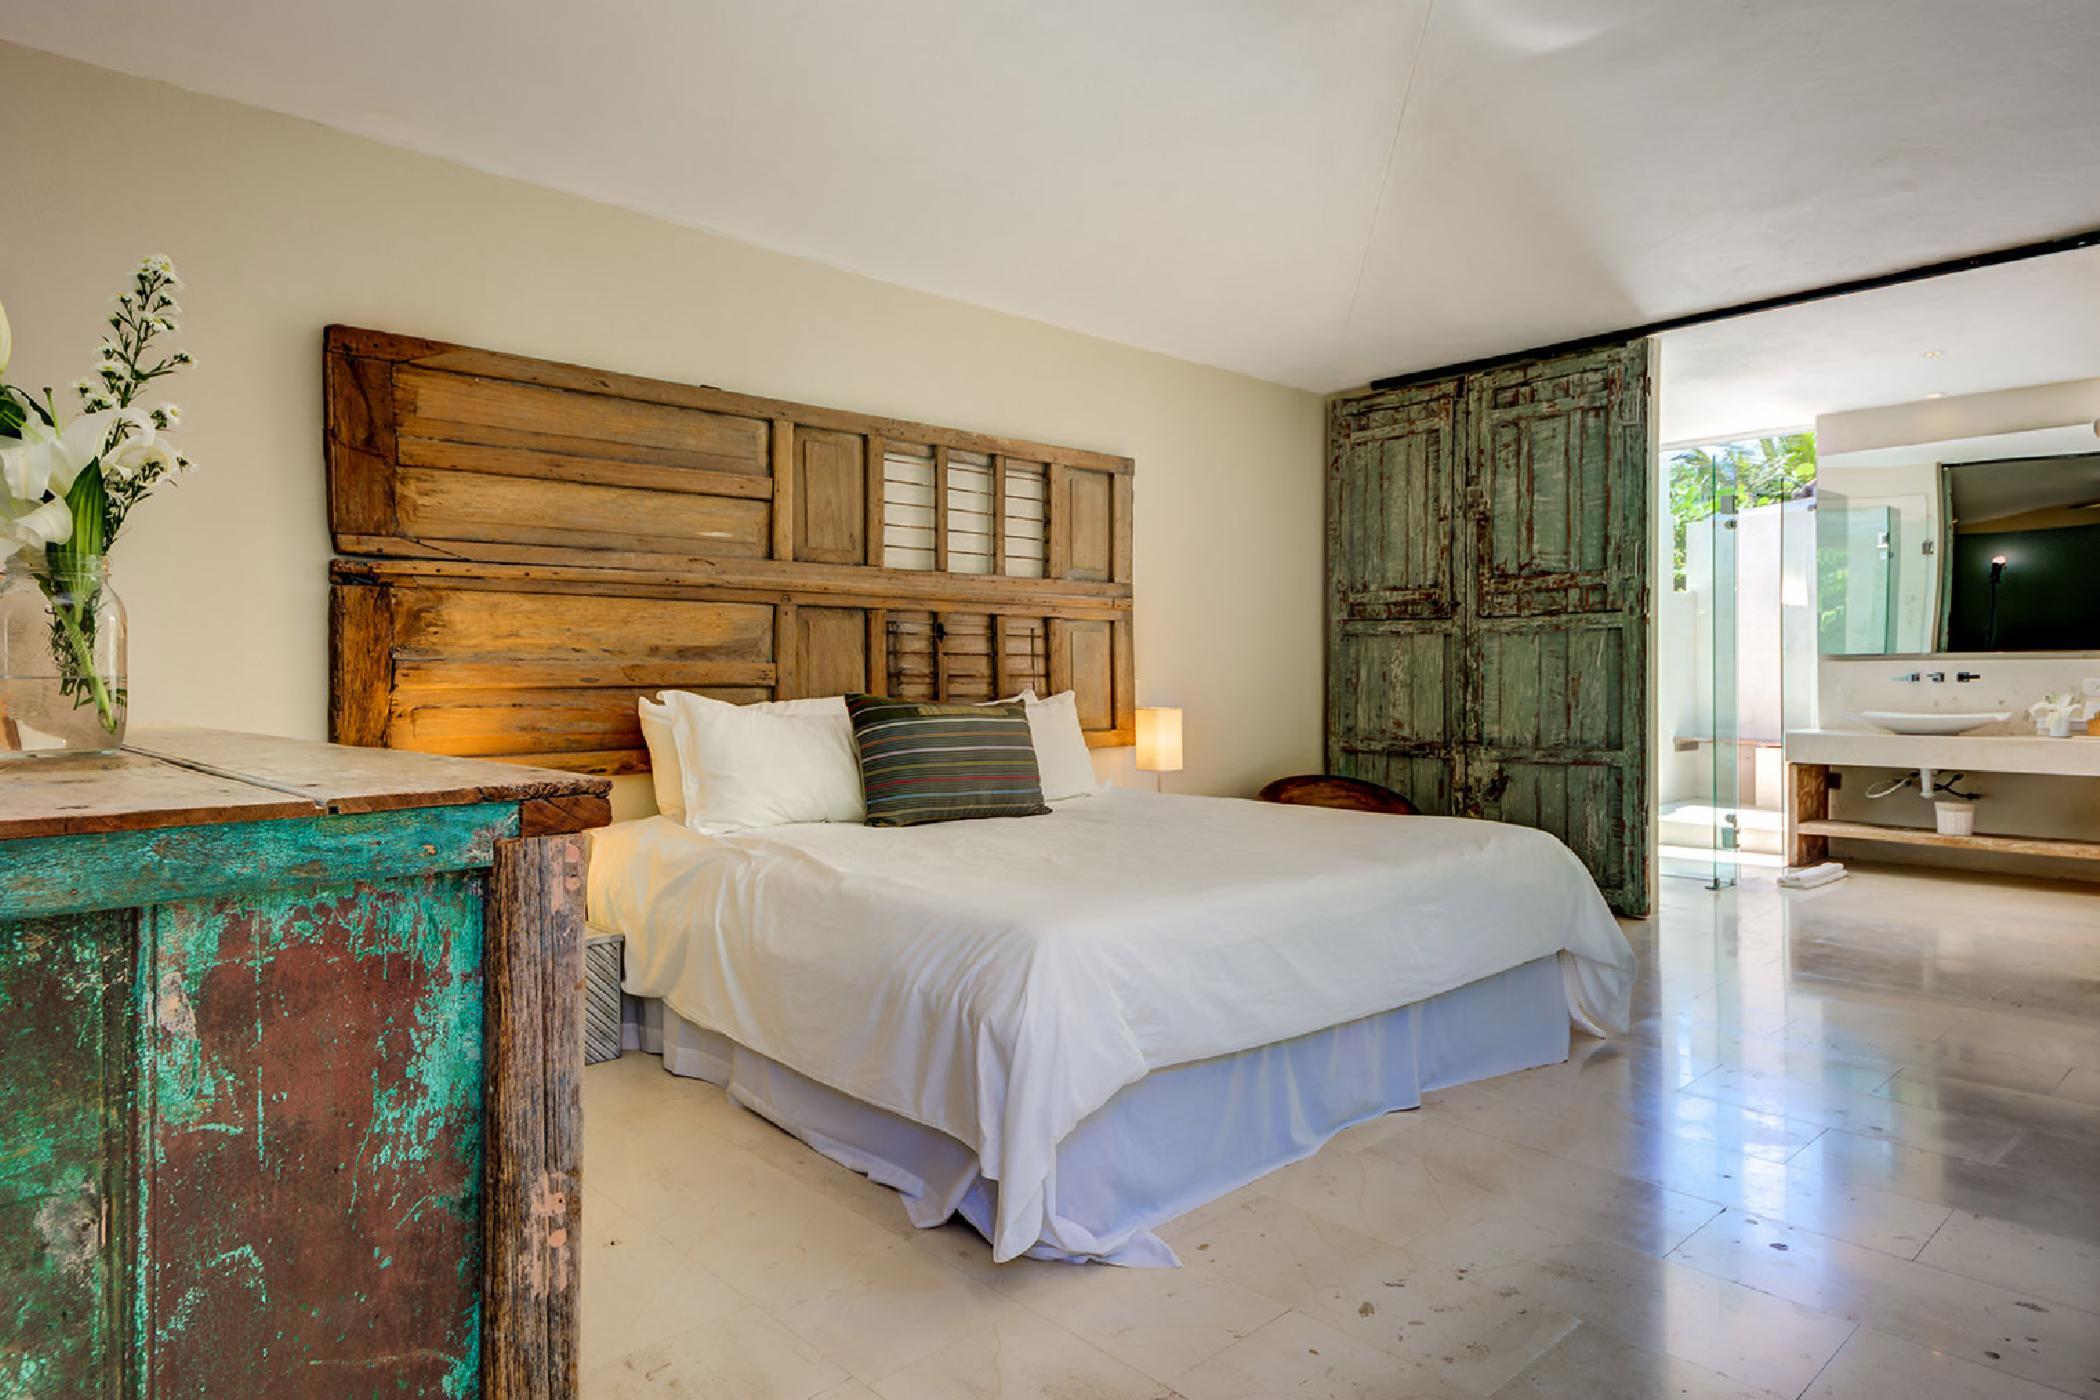 Maya_Luxe_Riviera_Maya_Luxury_Villas_Experiences_Puerto_Aventuras_5_Bedrooms_Zacil_Na_19.jpg